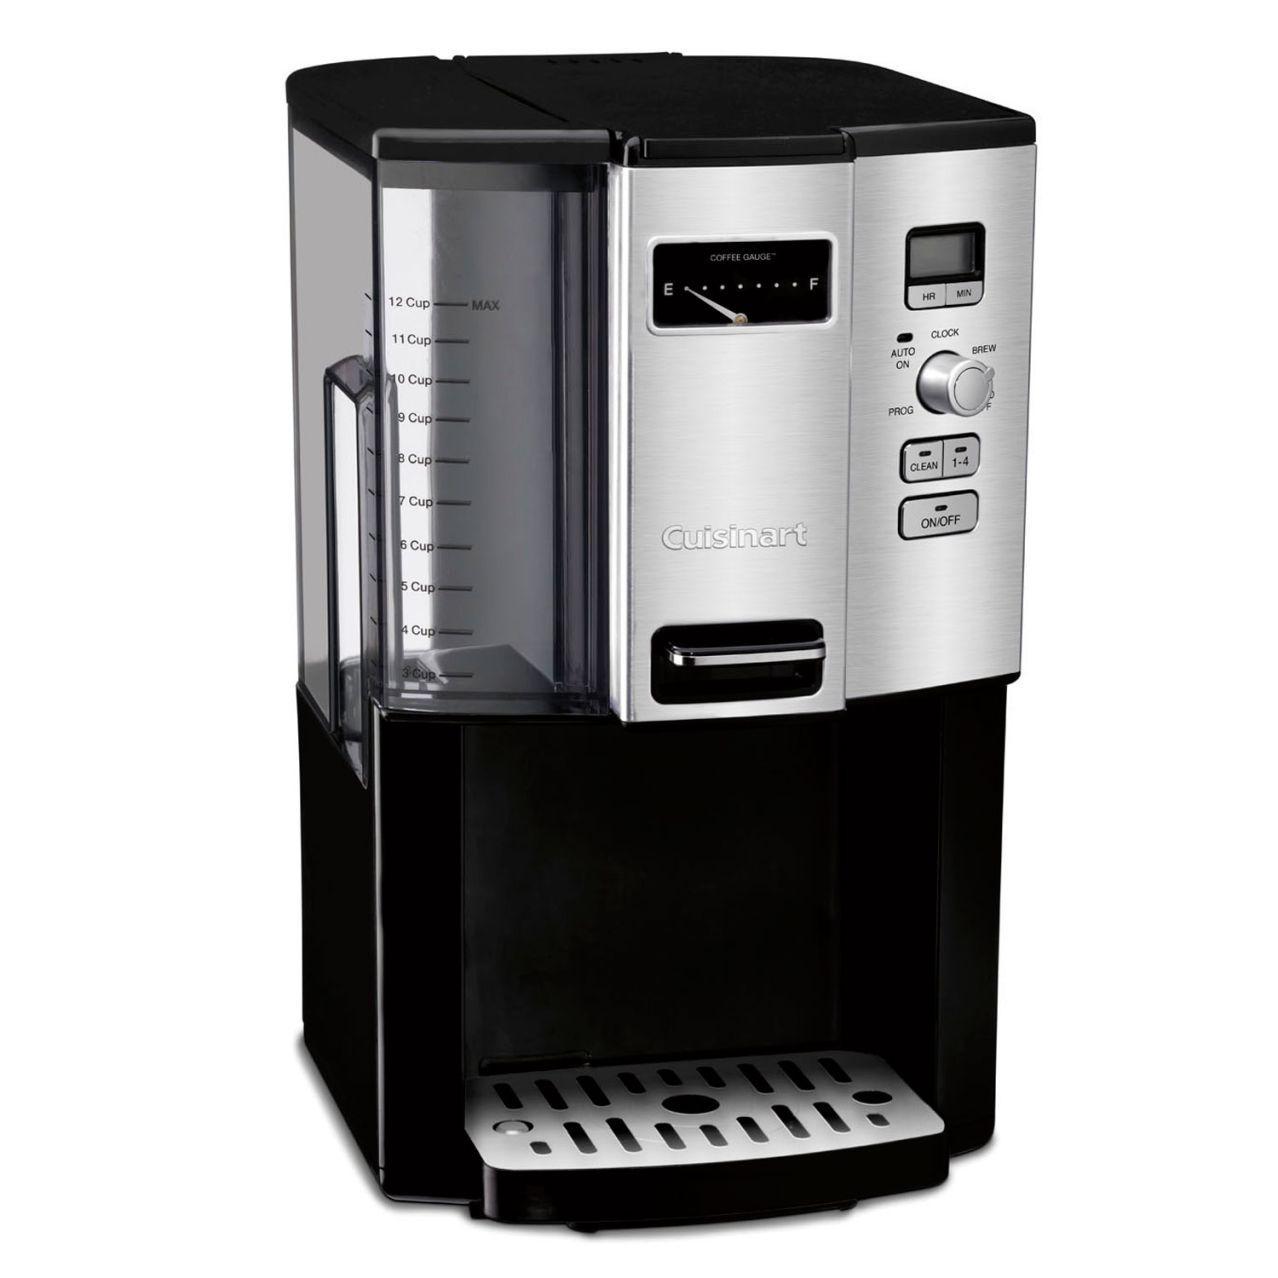 Cuisinart coffee on demand programmable coffeemaker